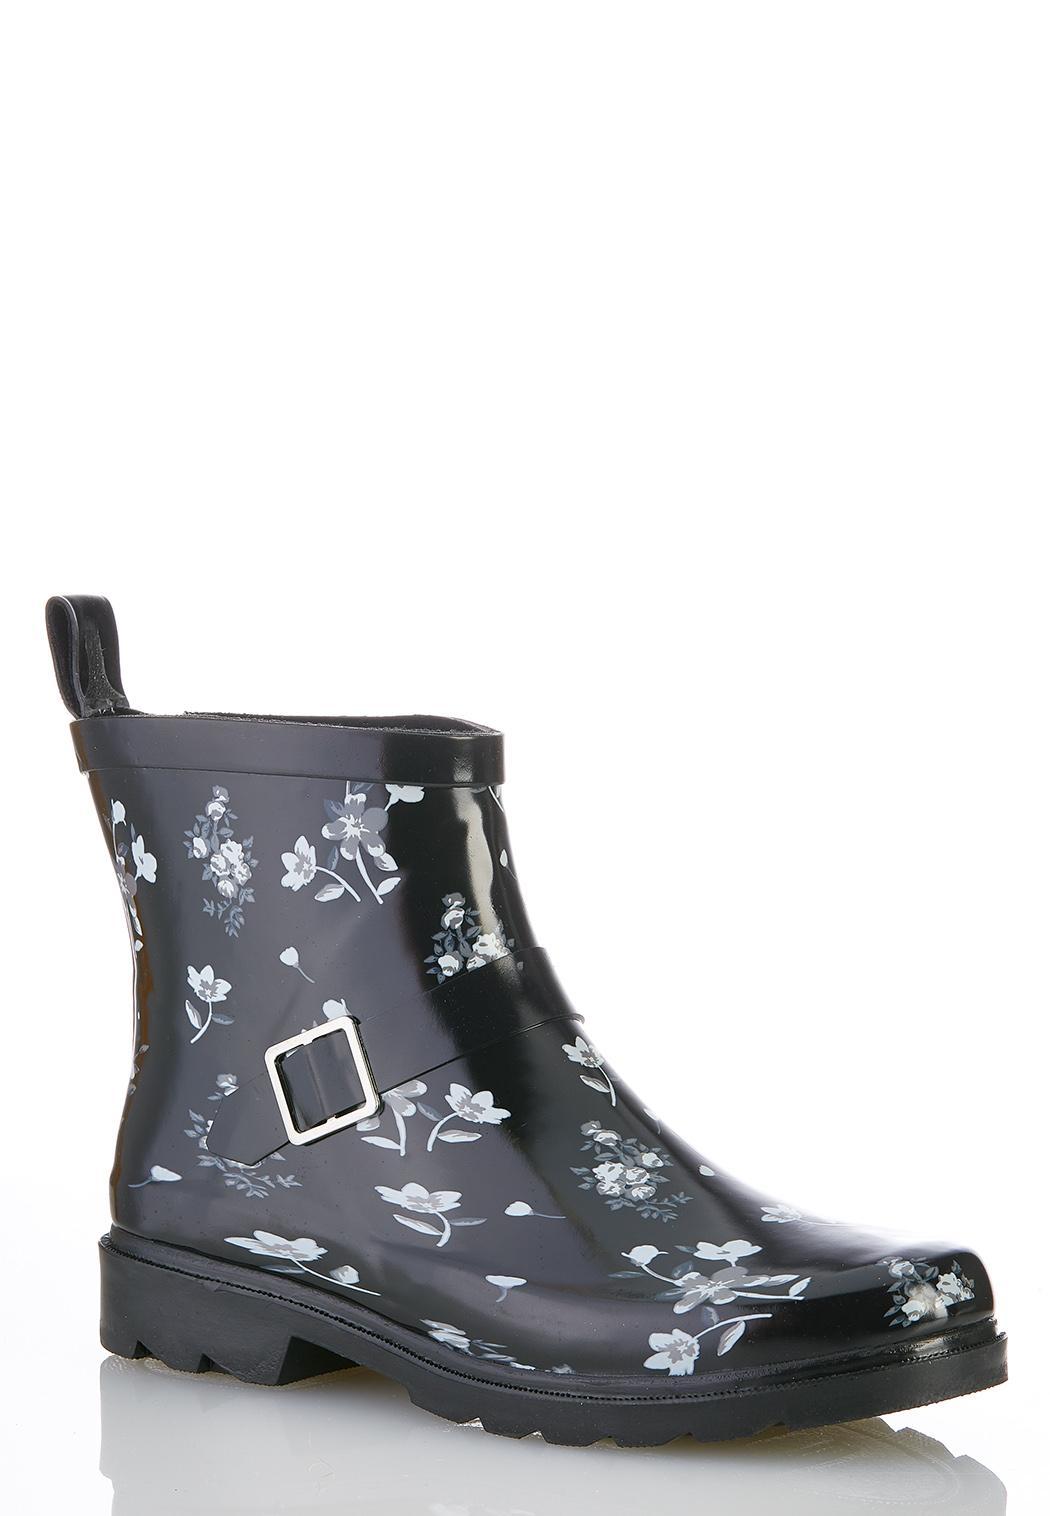 Floral Buckle Rain Boots